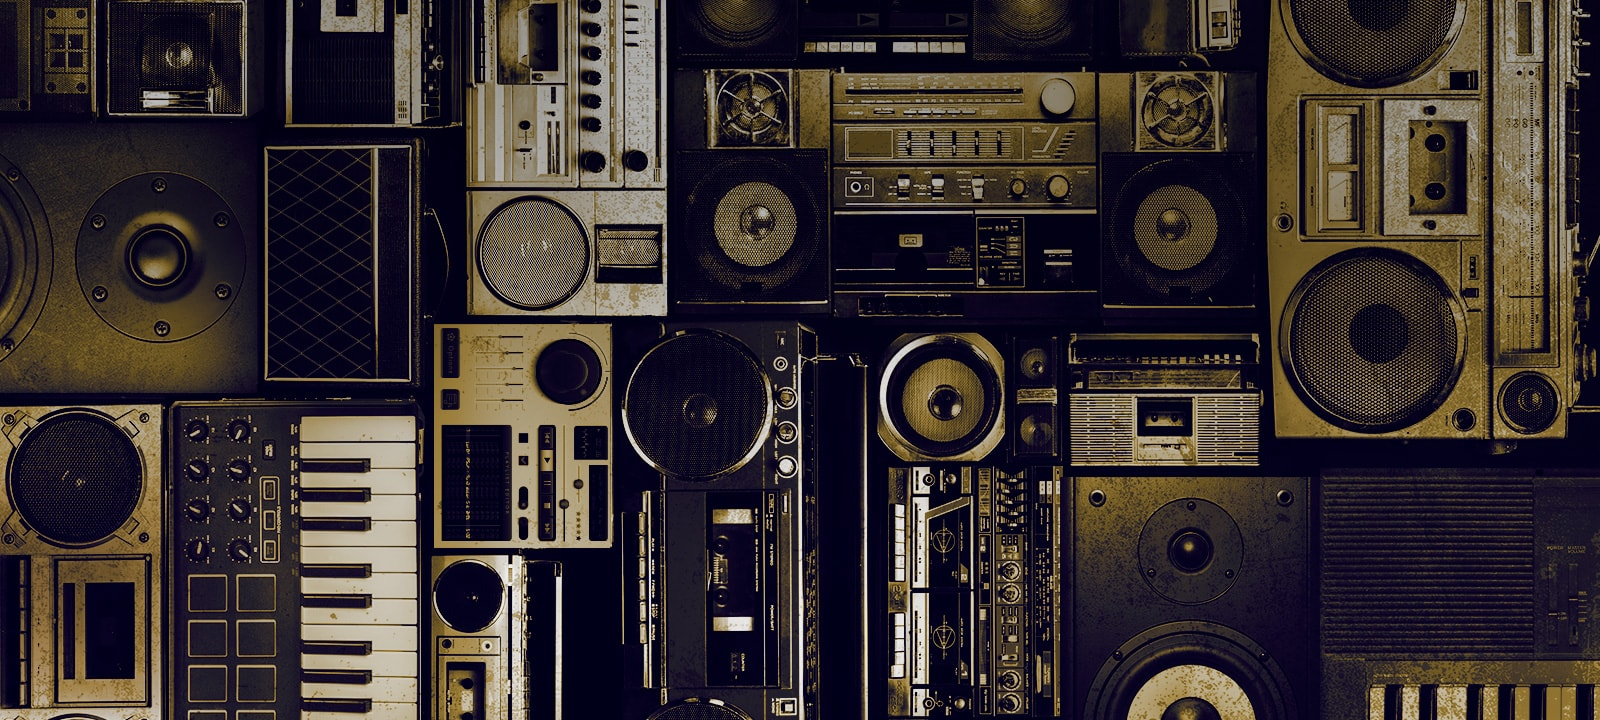 hip-hop-songs-that-shook-america-key-art-v2-800×600